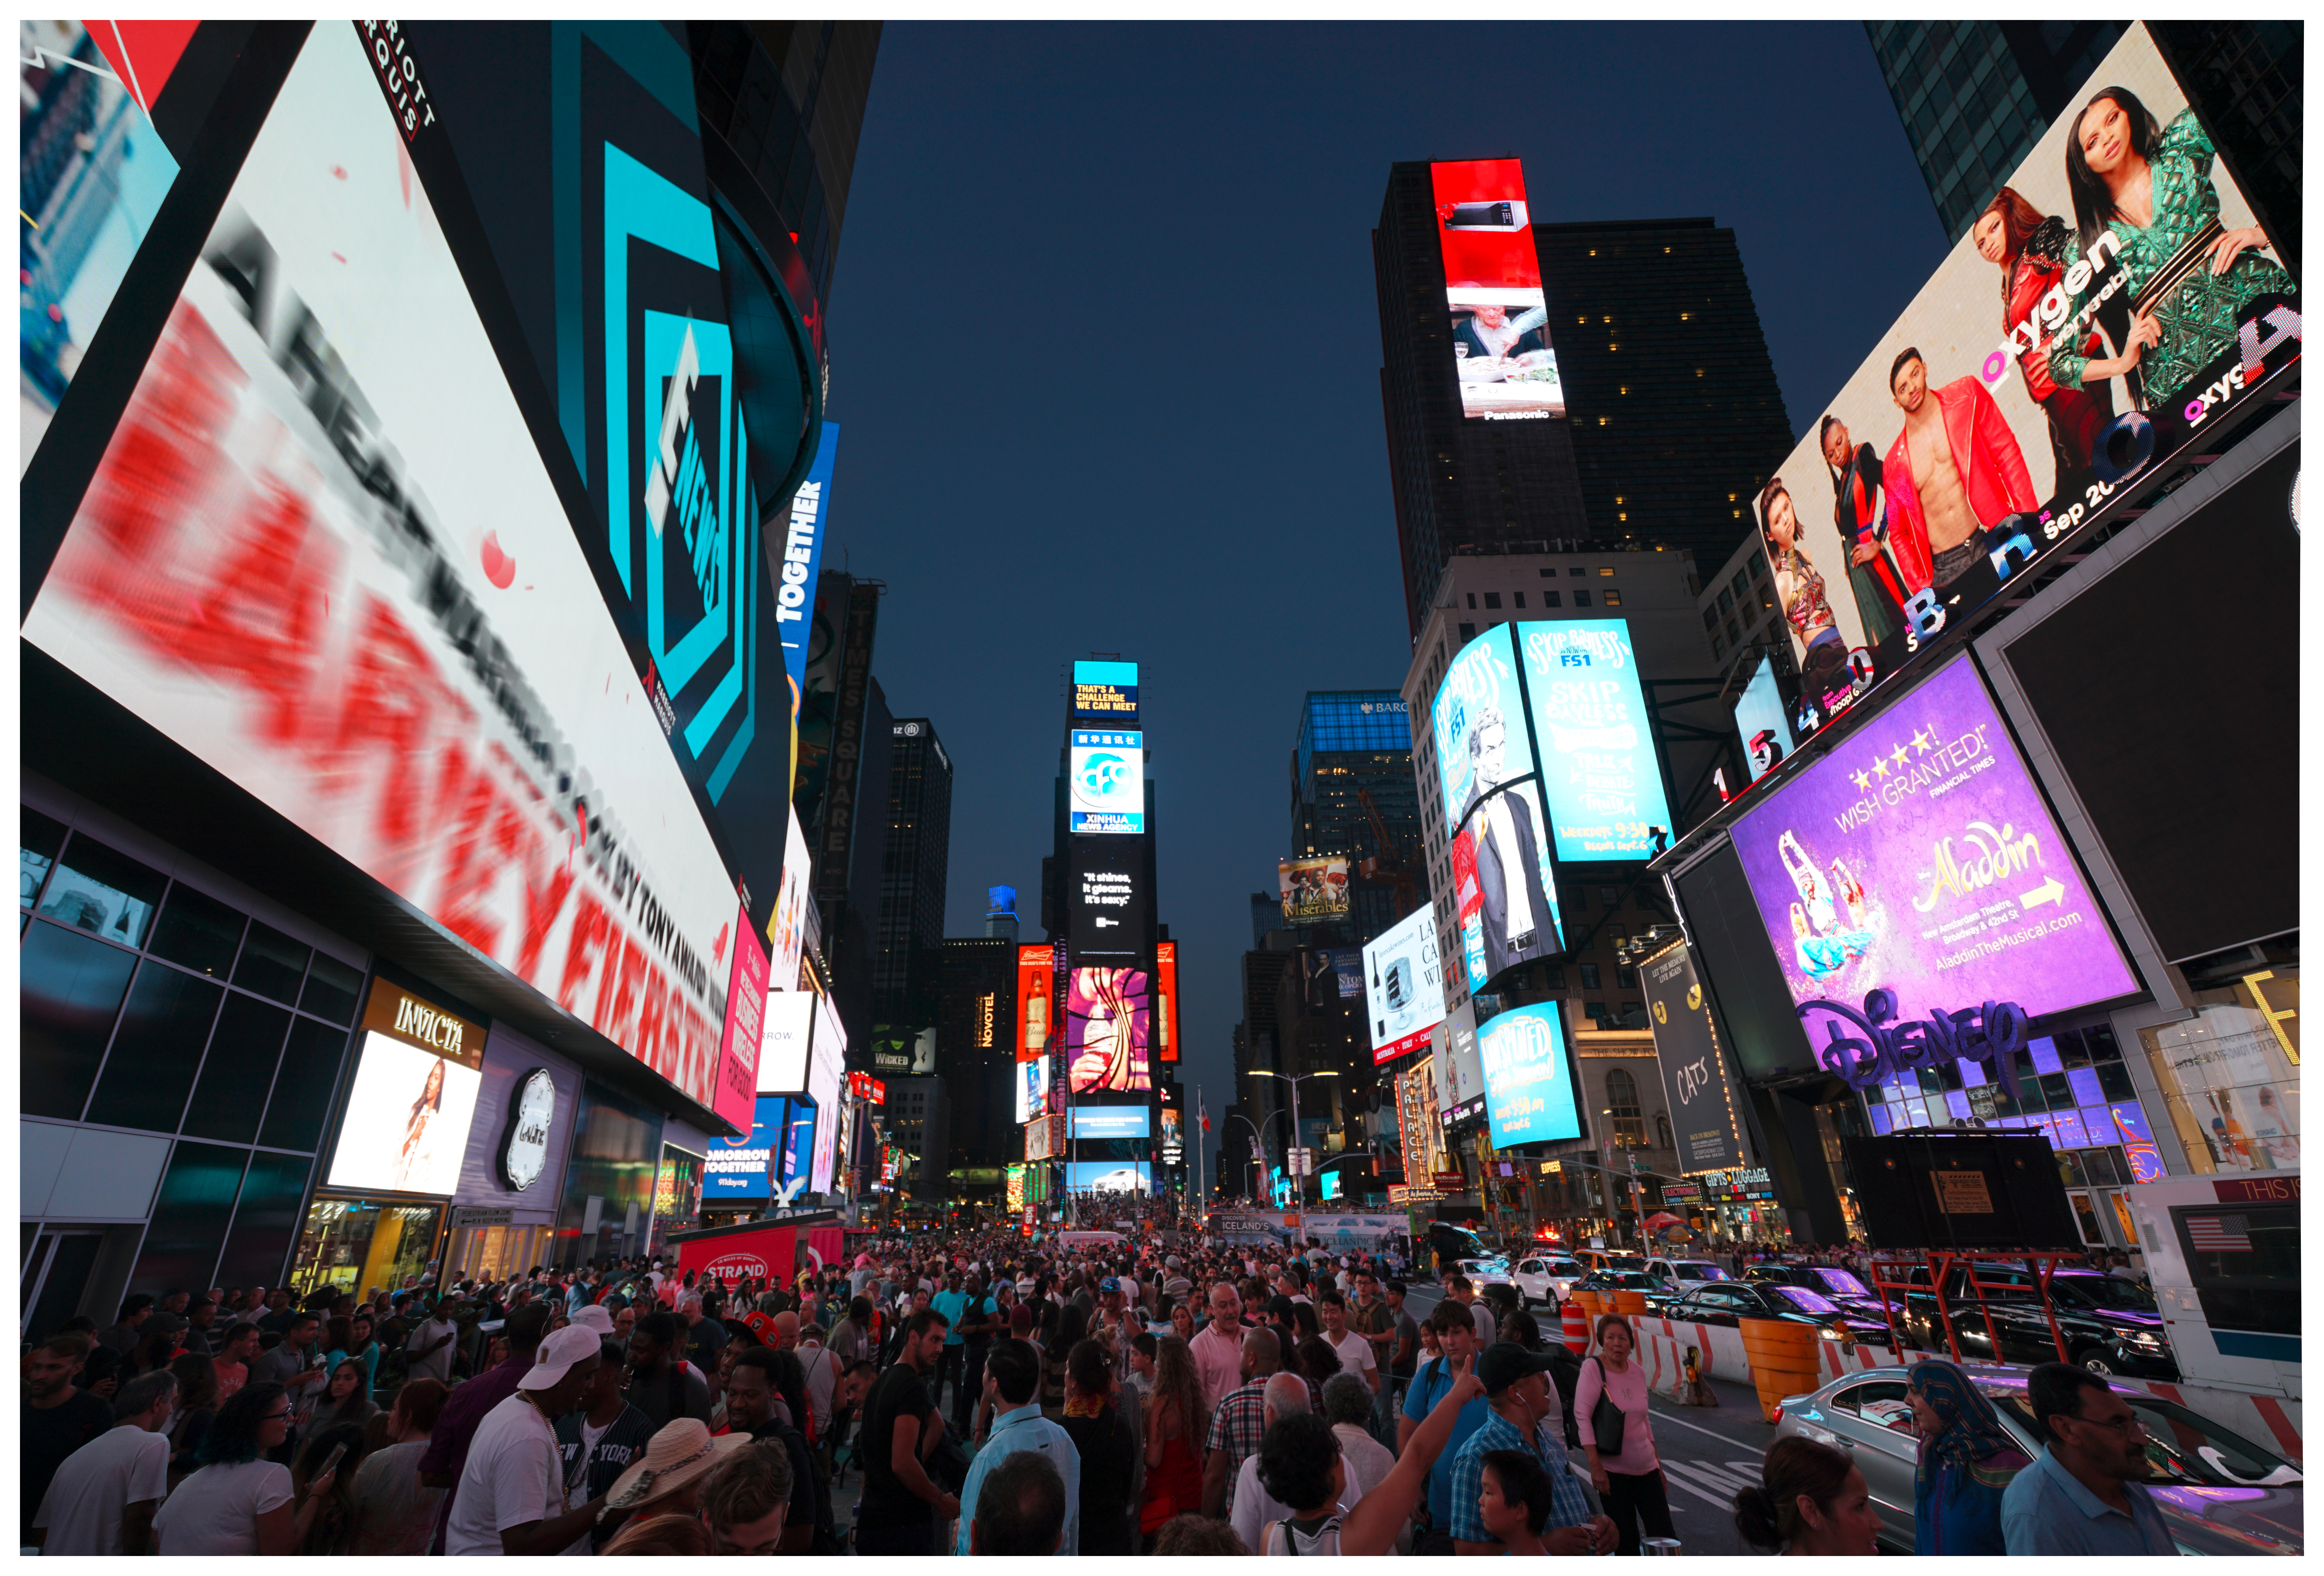 2016-09 New York-010-20160905, City, Crowd, People, HQ Photo